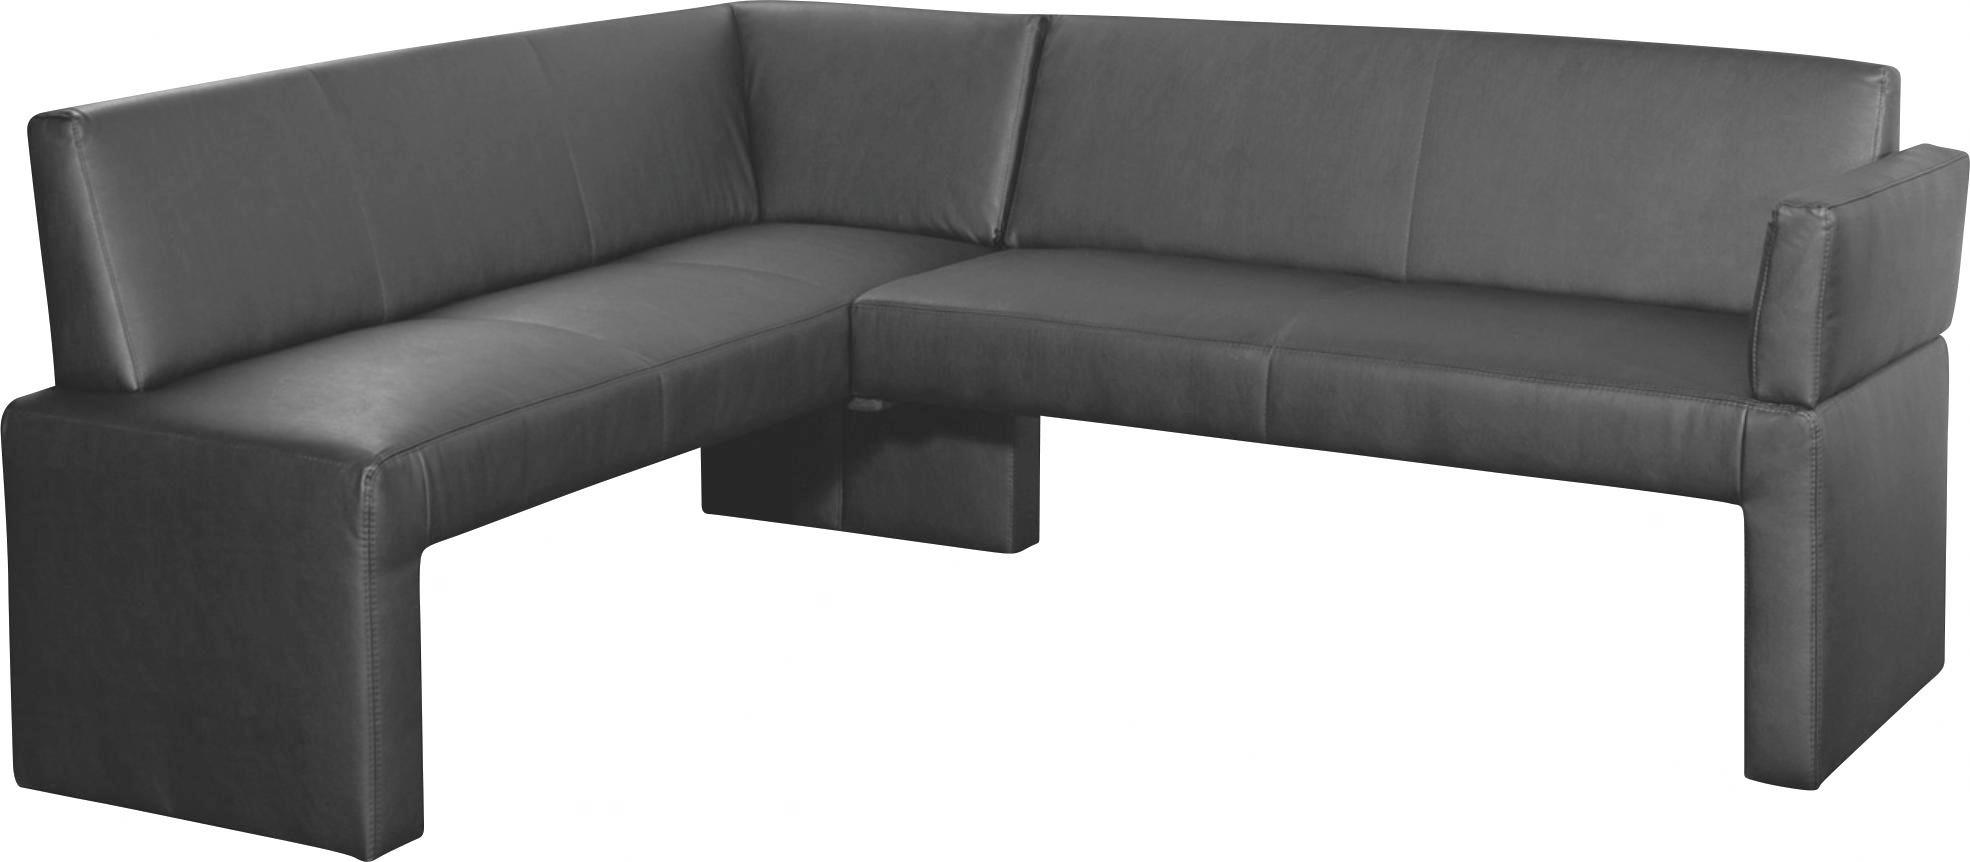 ECKBANK Lederlook Schwarz - Schwarz, Design, Kunststoff/Textil (171/84/212cm)